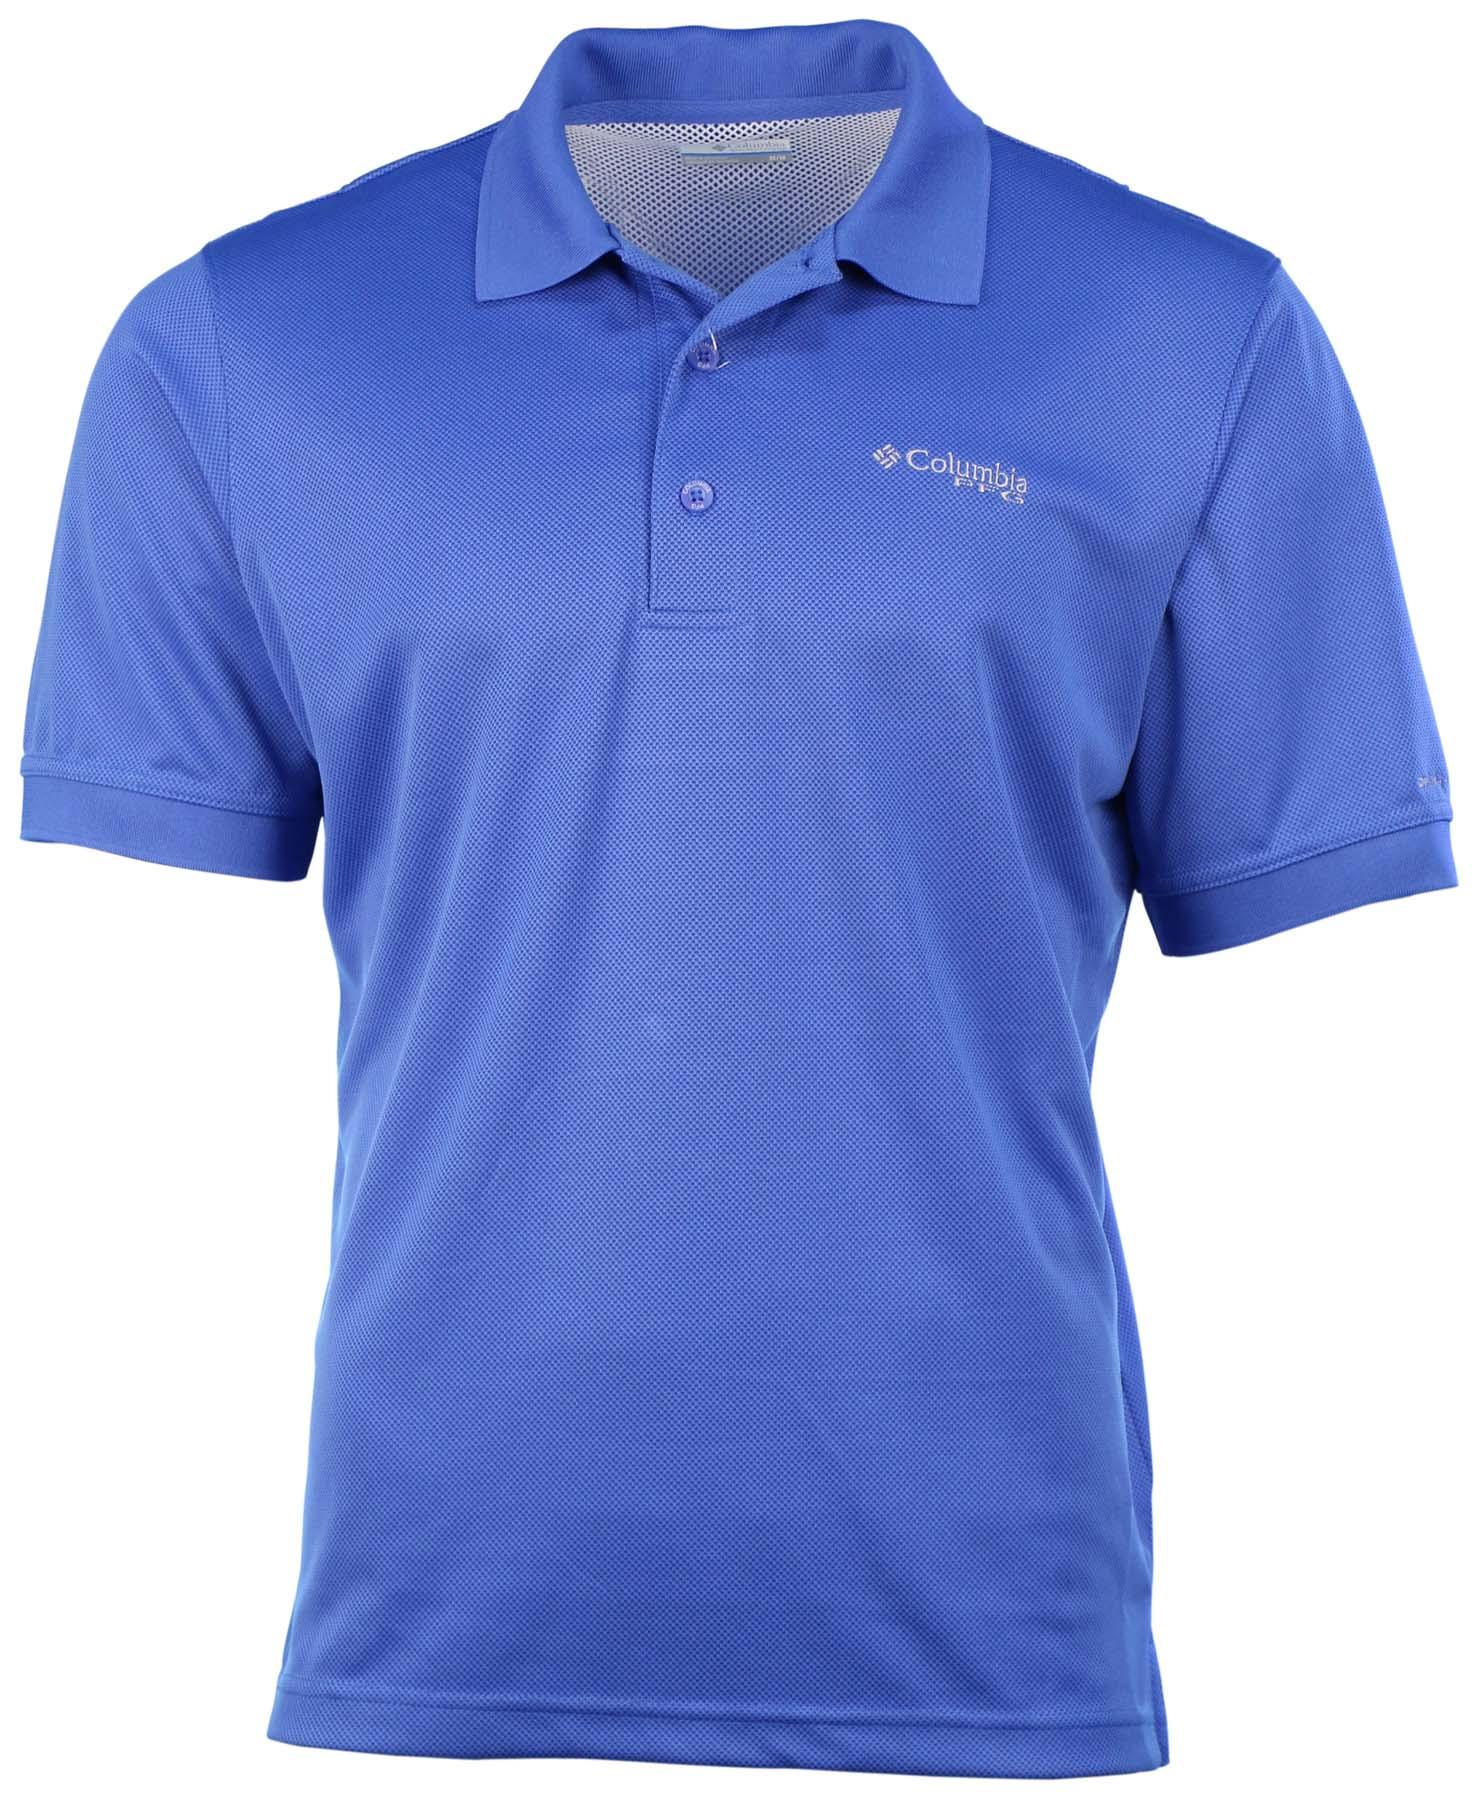 Columbia Men's Shields River Omni-Wick PFG Polo Shirt | eBay